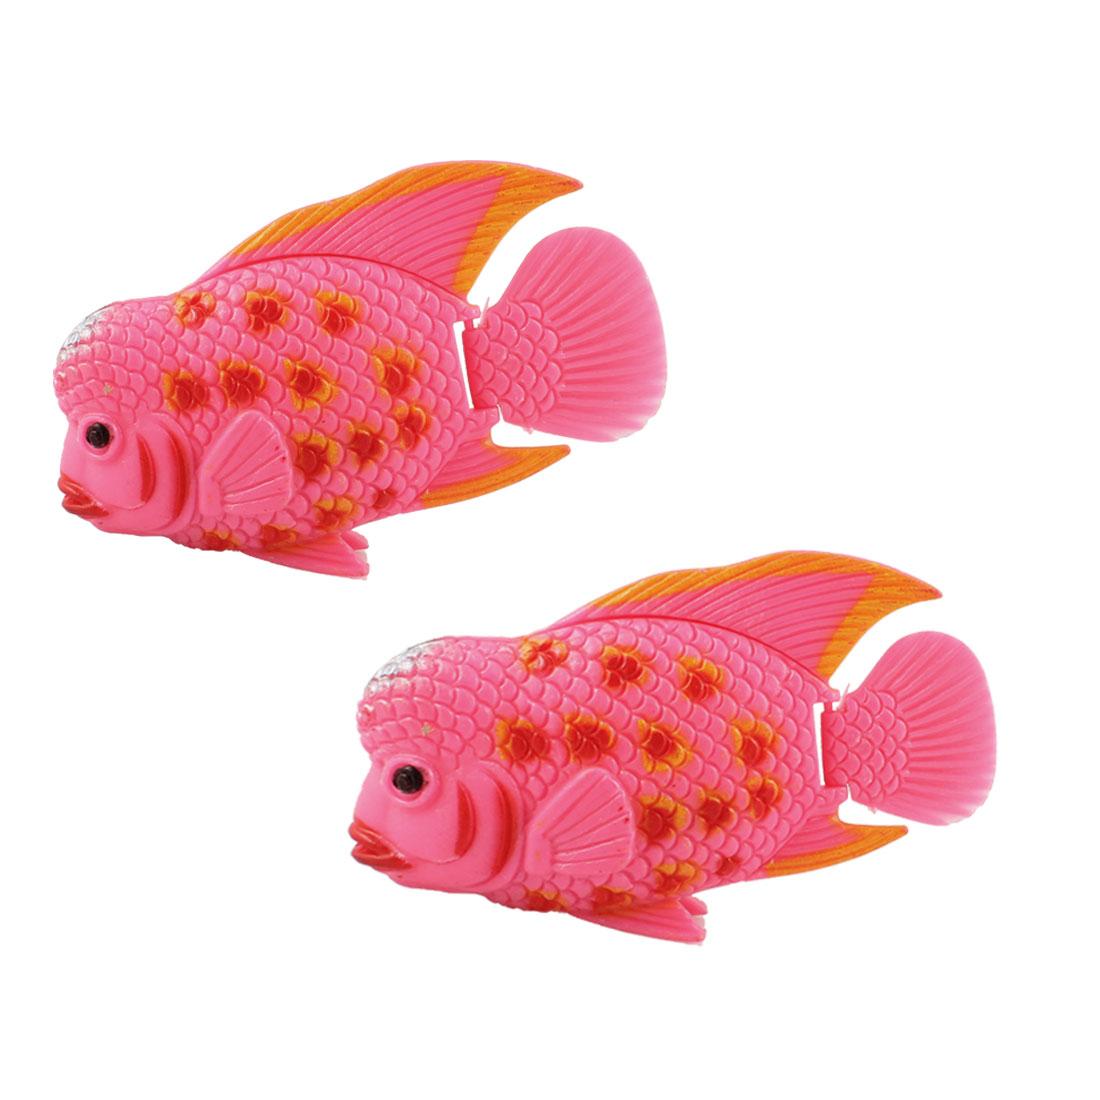 2 Pcs Manmade Tropical Pink Plastic Fishes Aquarium Fish Tank Decoration Ornament